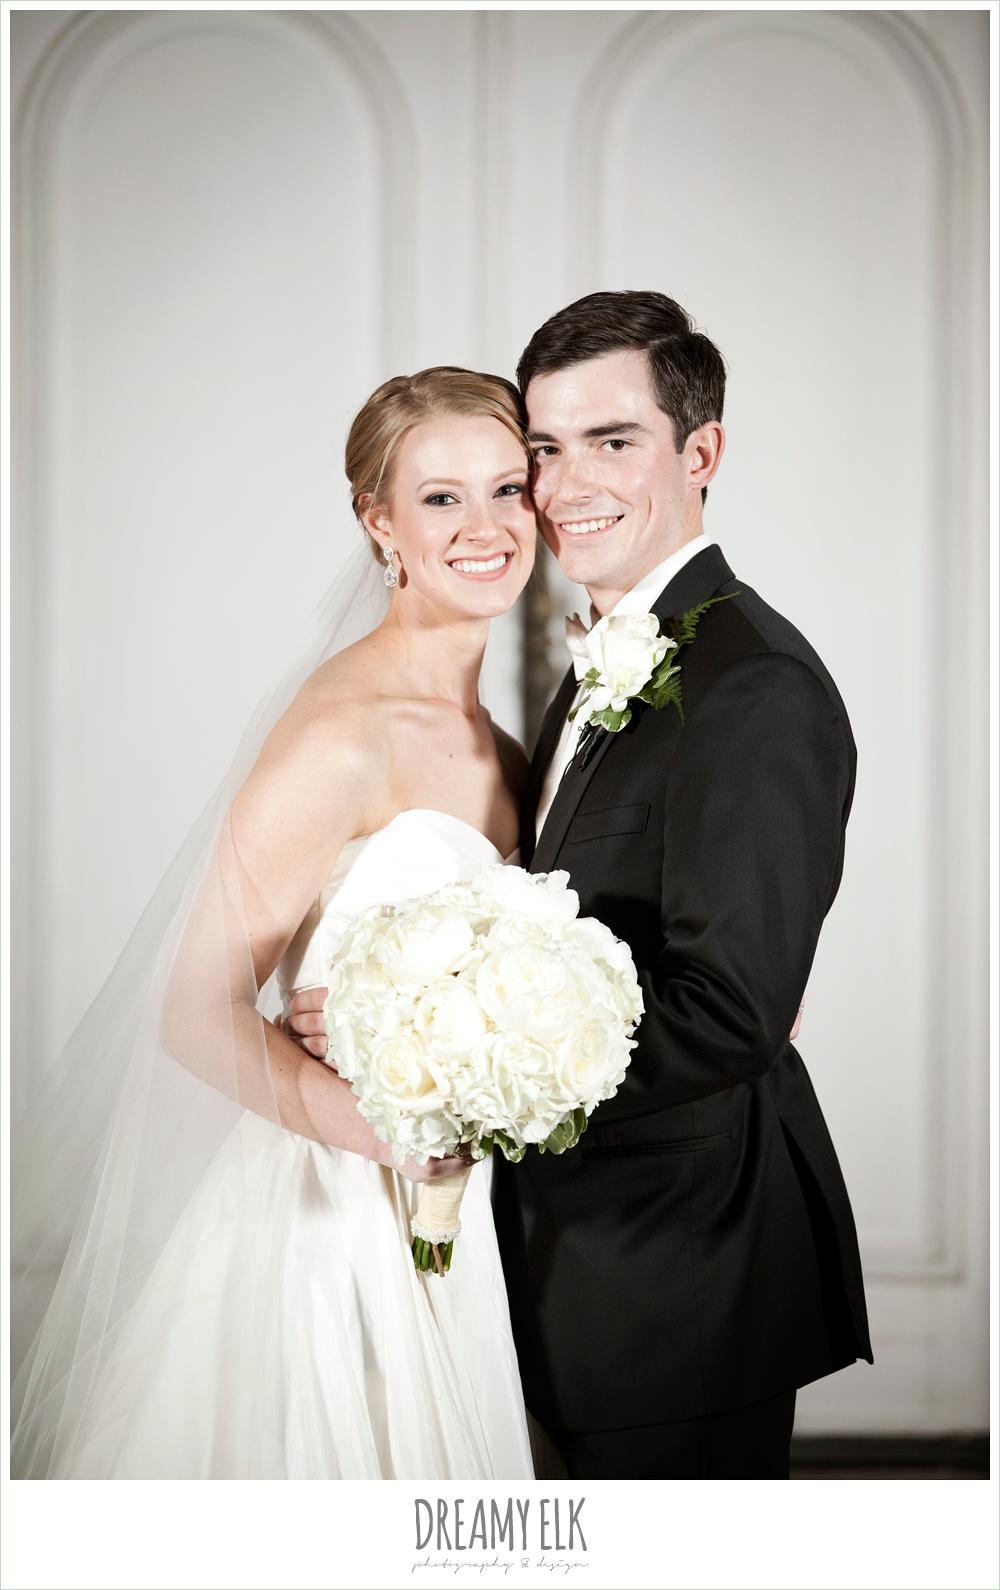 bride and groom, white wedding bouquet, winter wedding, austin wedding photographer, dreamy elk photography and design